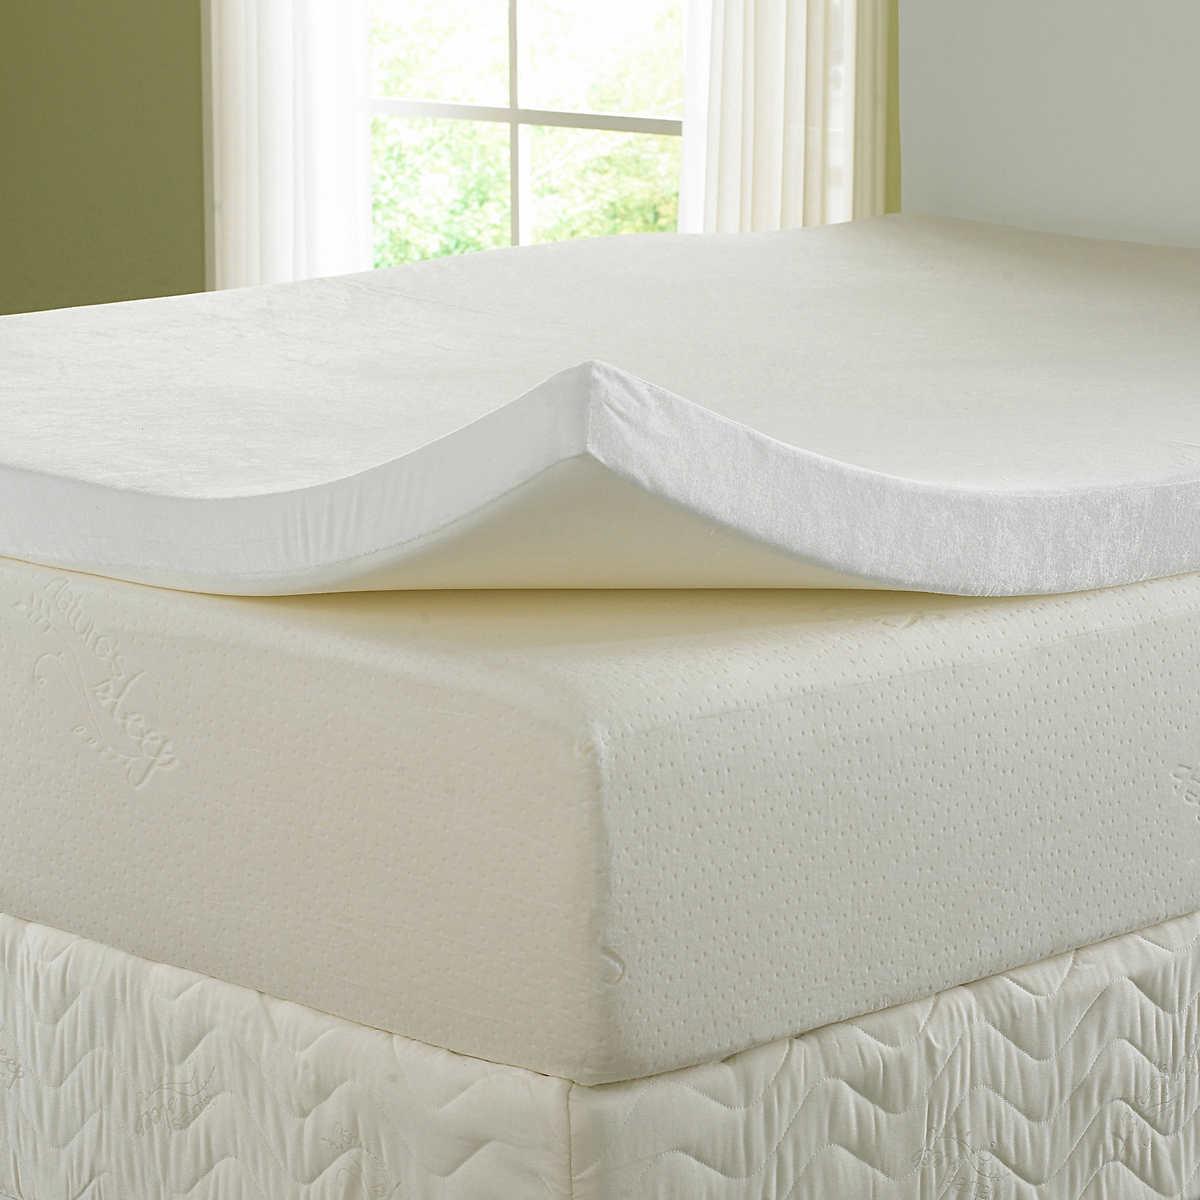 cubre colchón viscoelástico